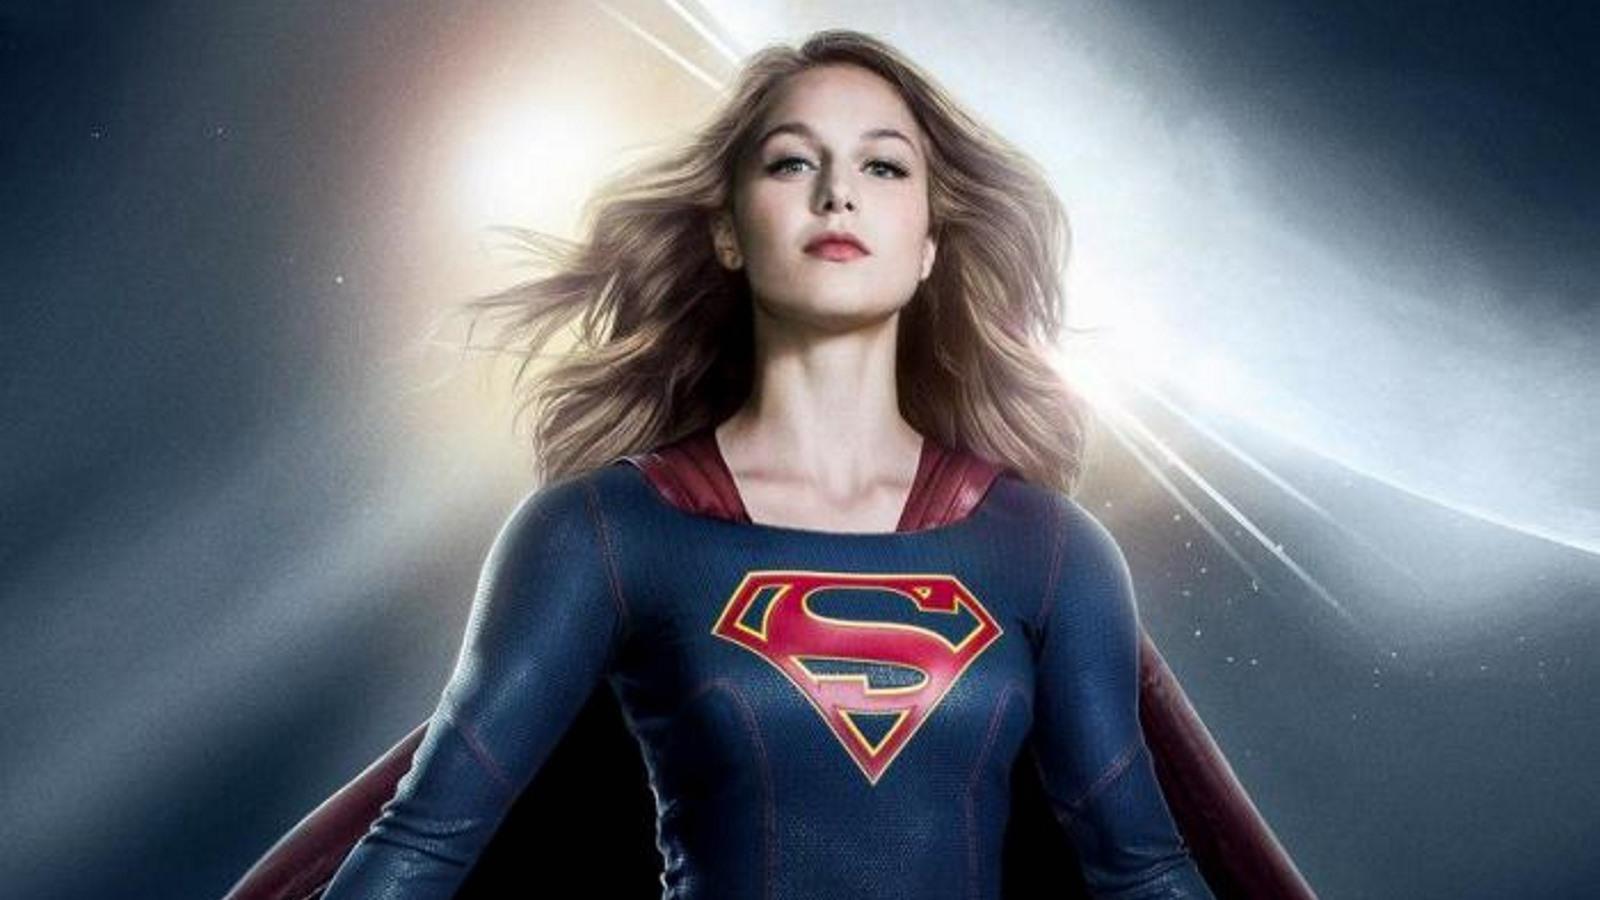 Mejores series de superheroes - Supergirl